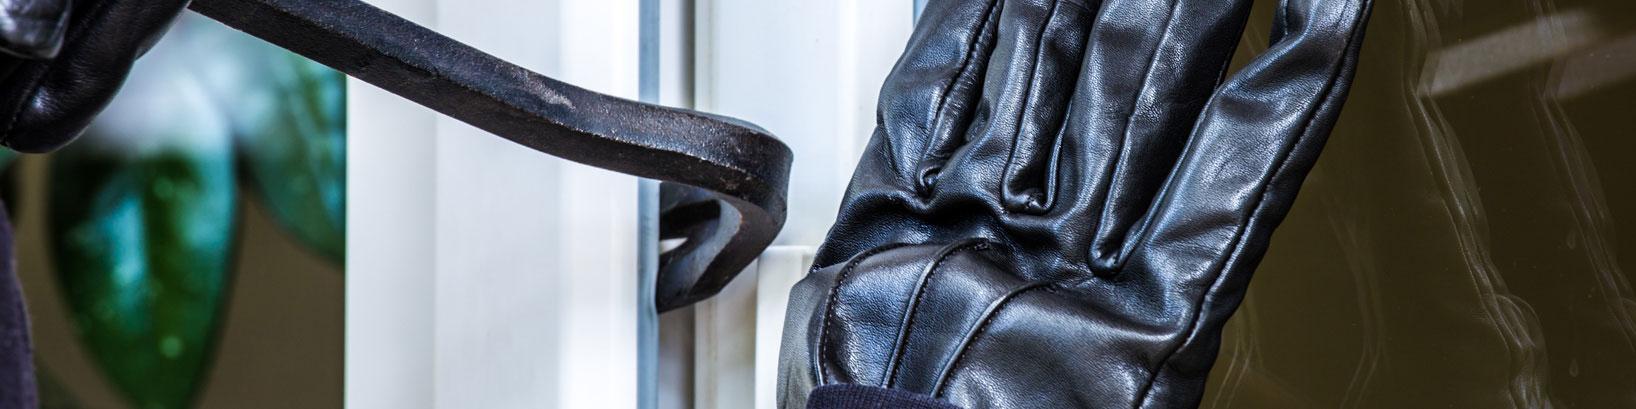 Sicherheitsfenster Saarland, DICA Fester & Türen